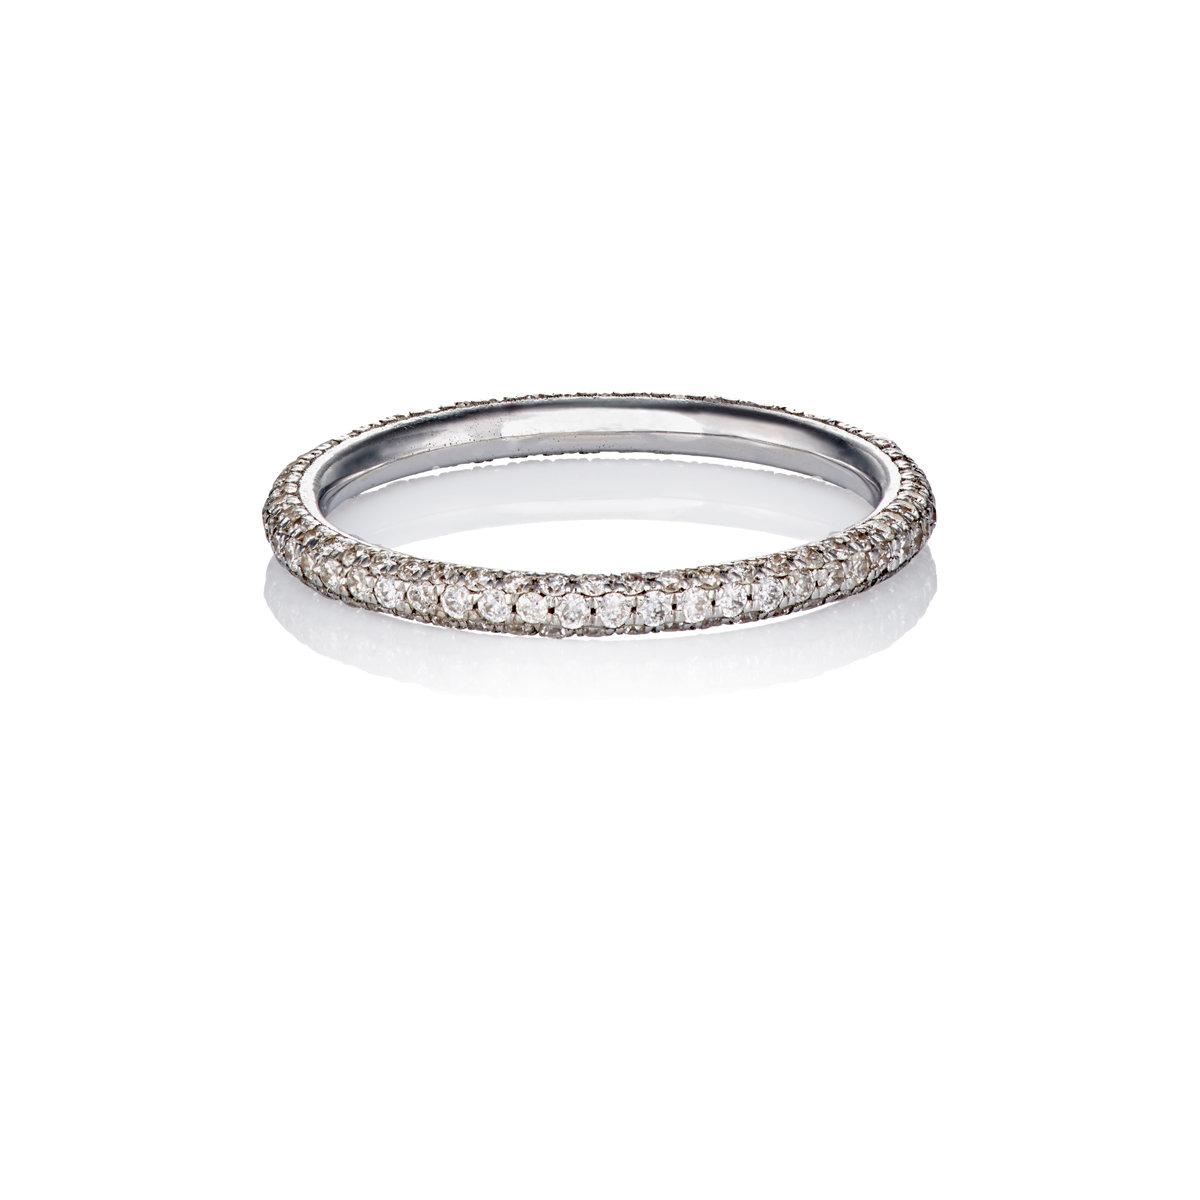 Ileana Makri Womens Half Crown Ring JxUrg